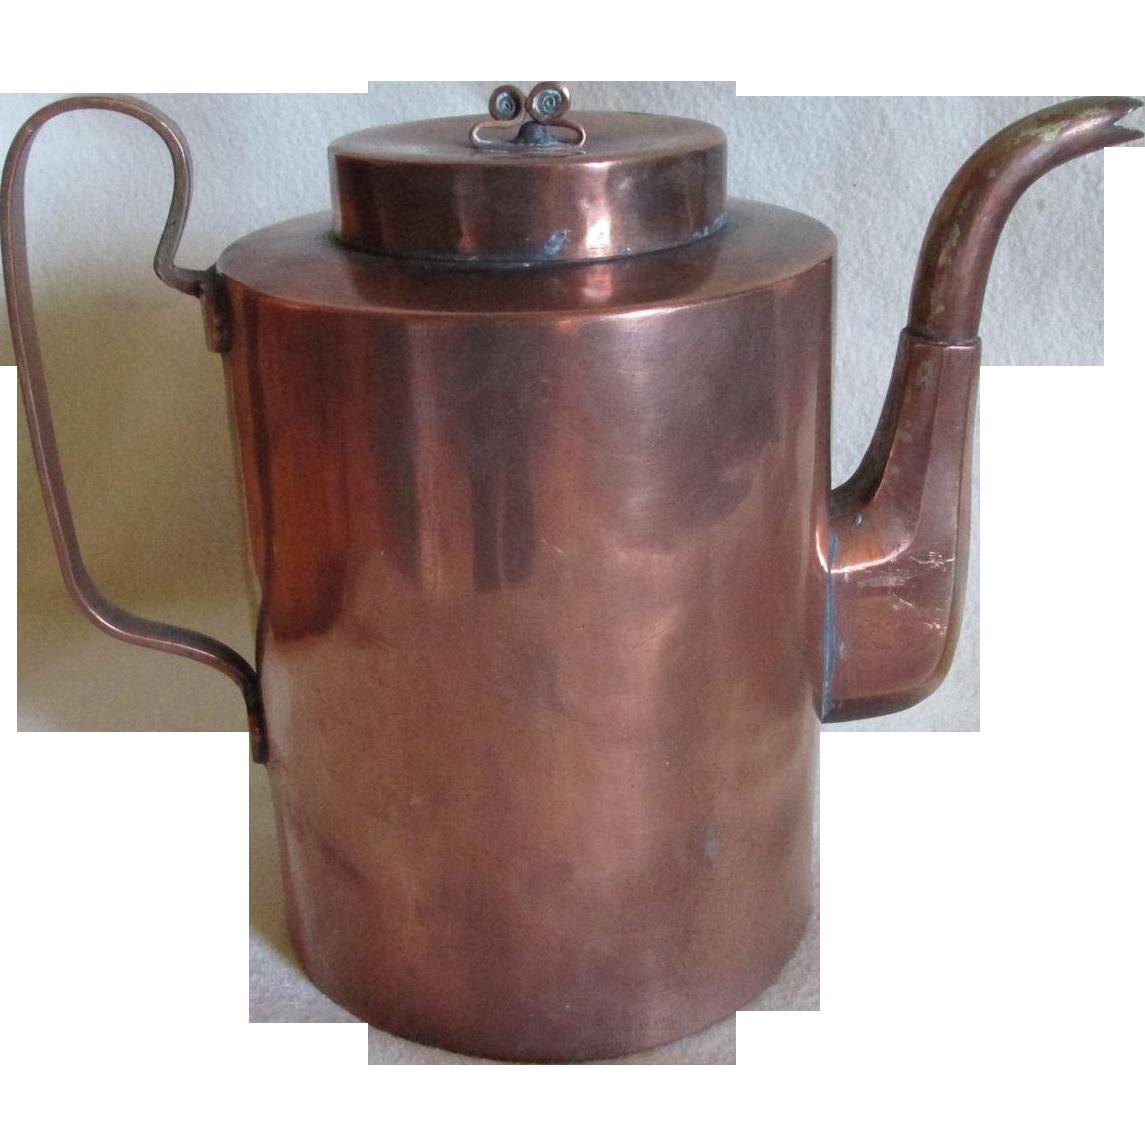 19thC European Goose Neck Copper Coffee Pot